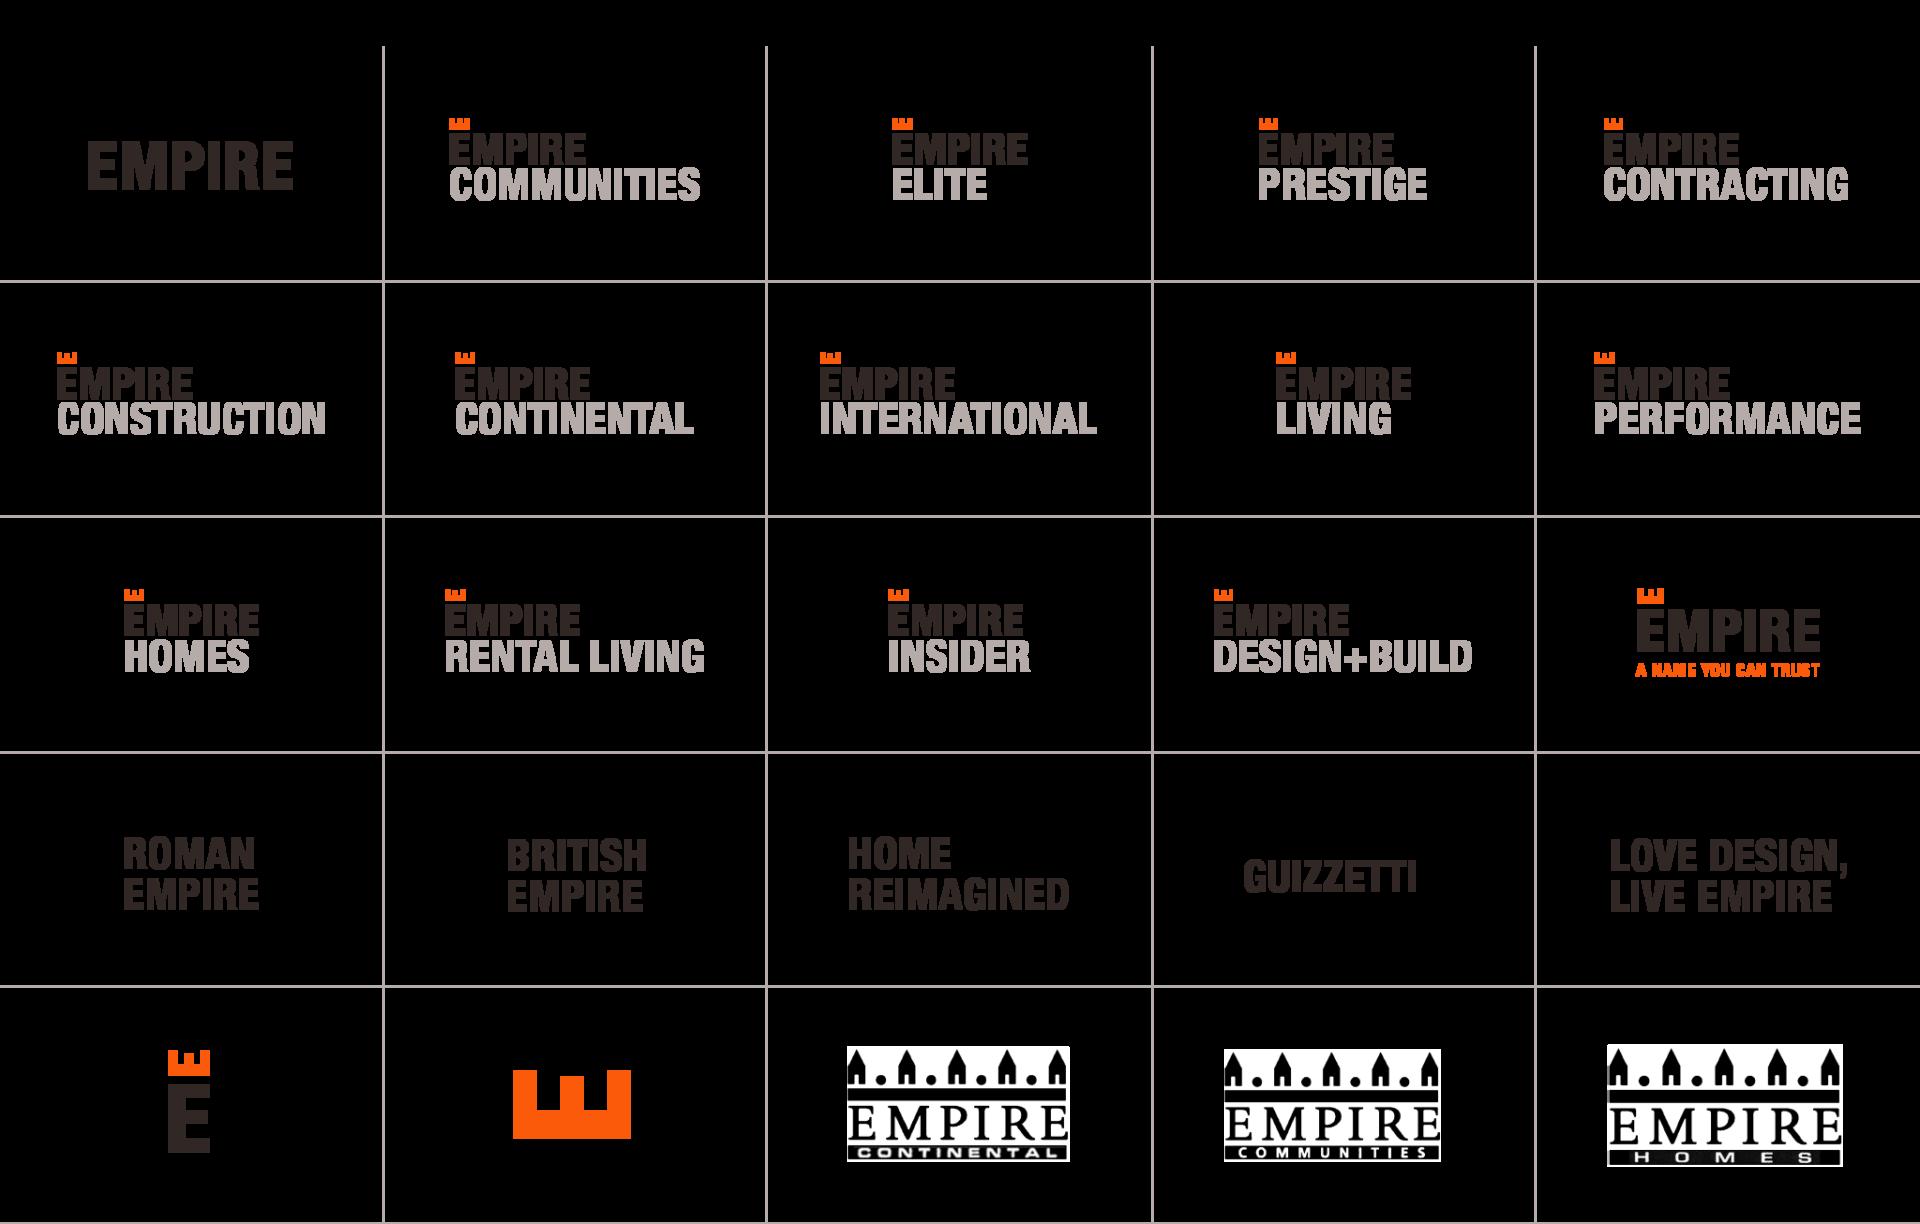 Empire At Work – Legal Trademarksimage_block-block_607f33108e716